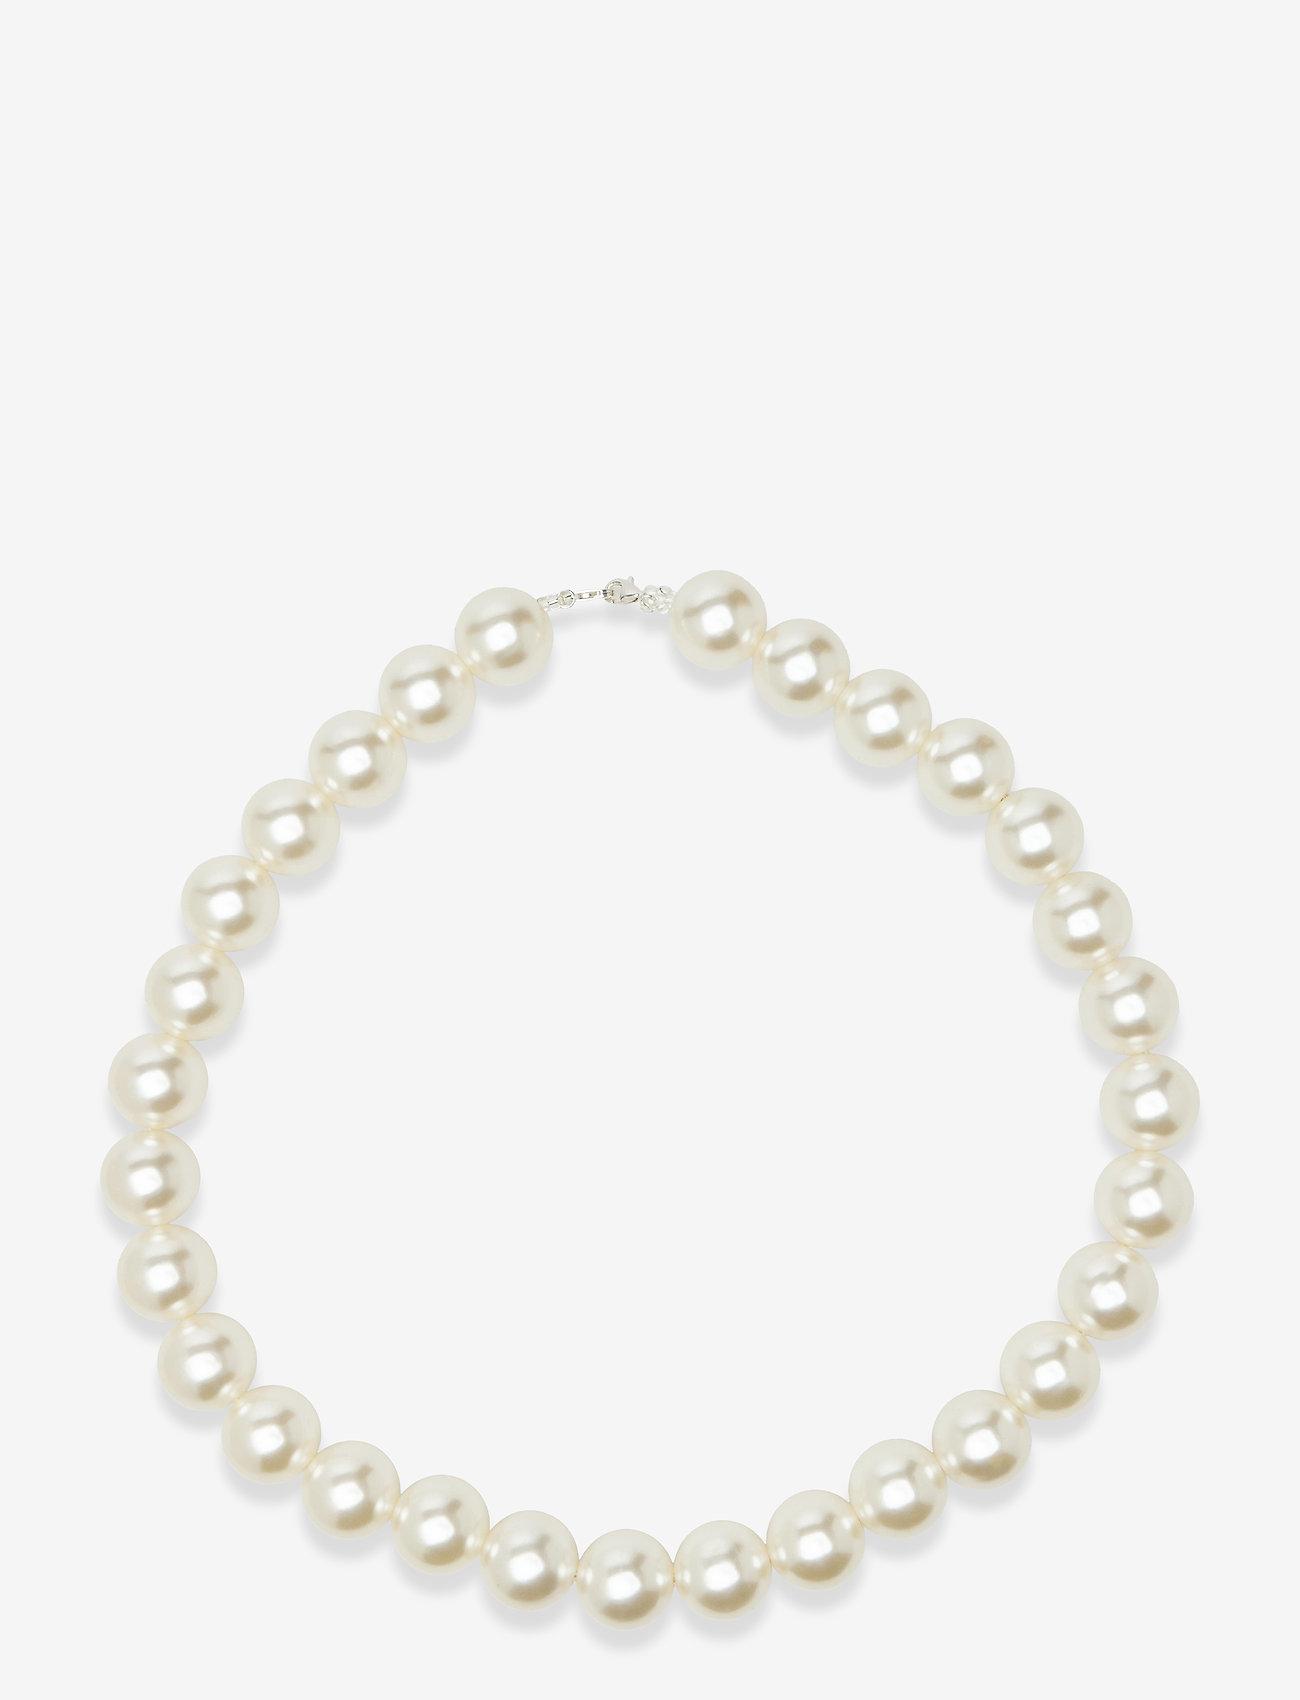 Custommade - Zerma Pearl - dainty - whisper white - 1